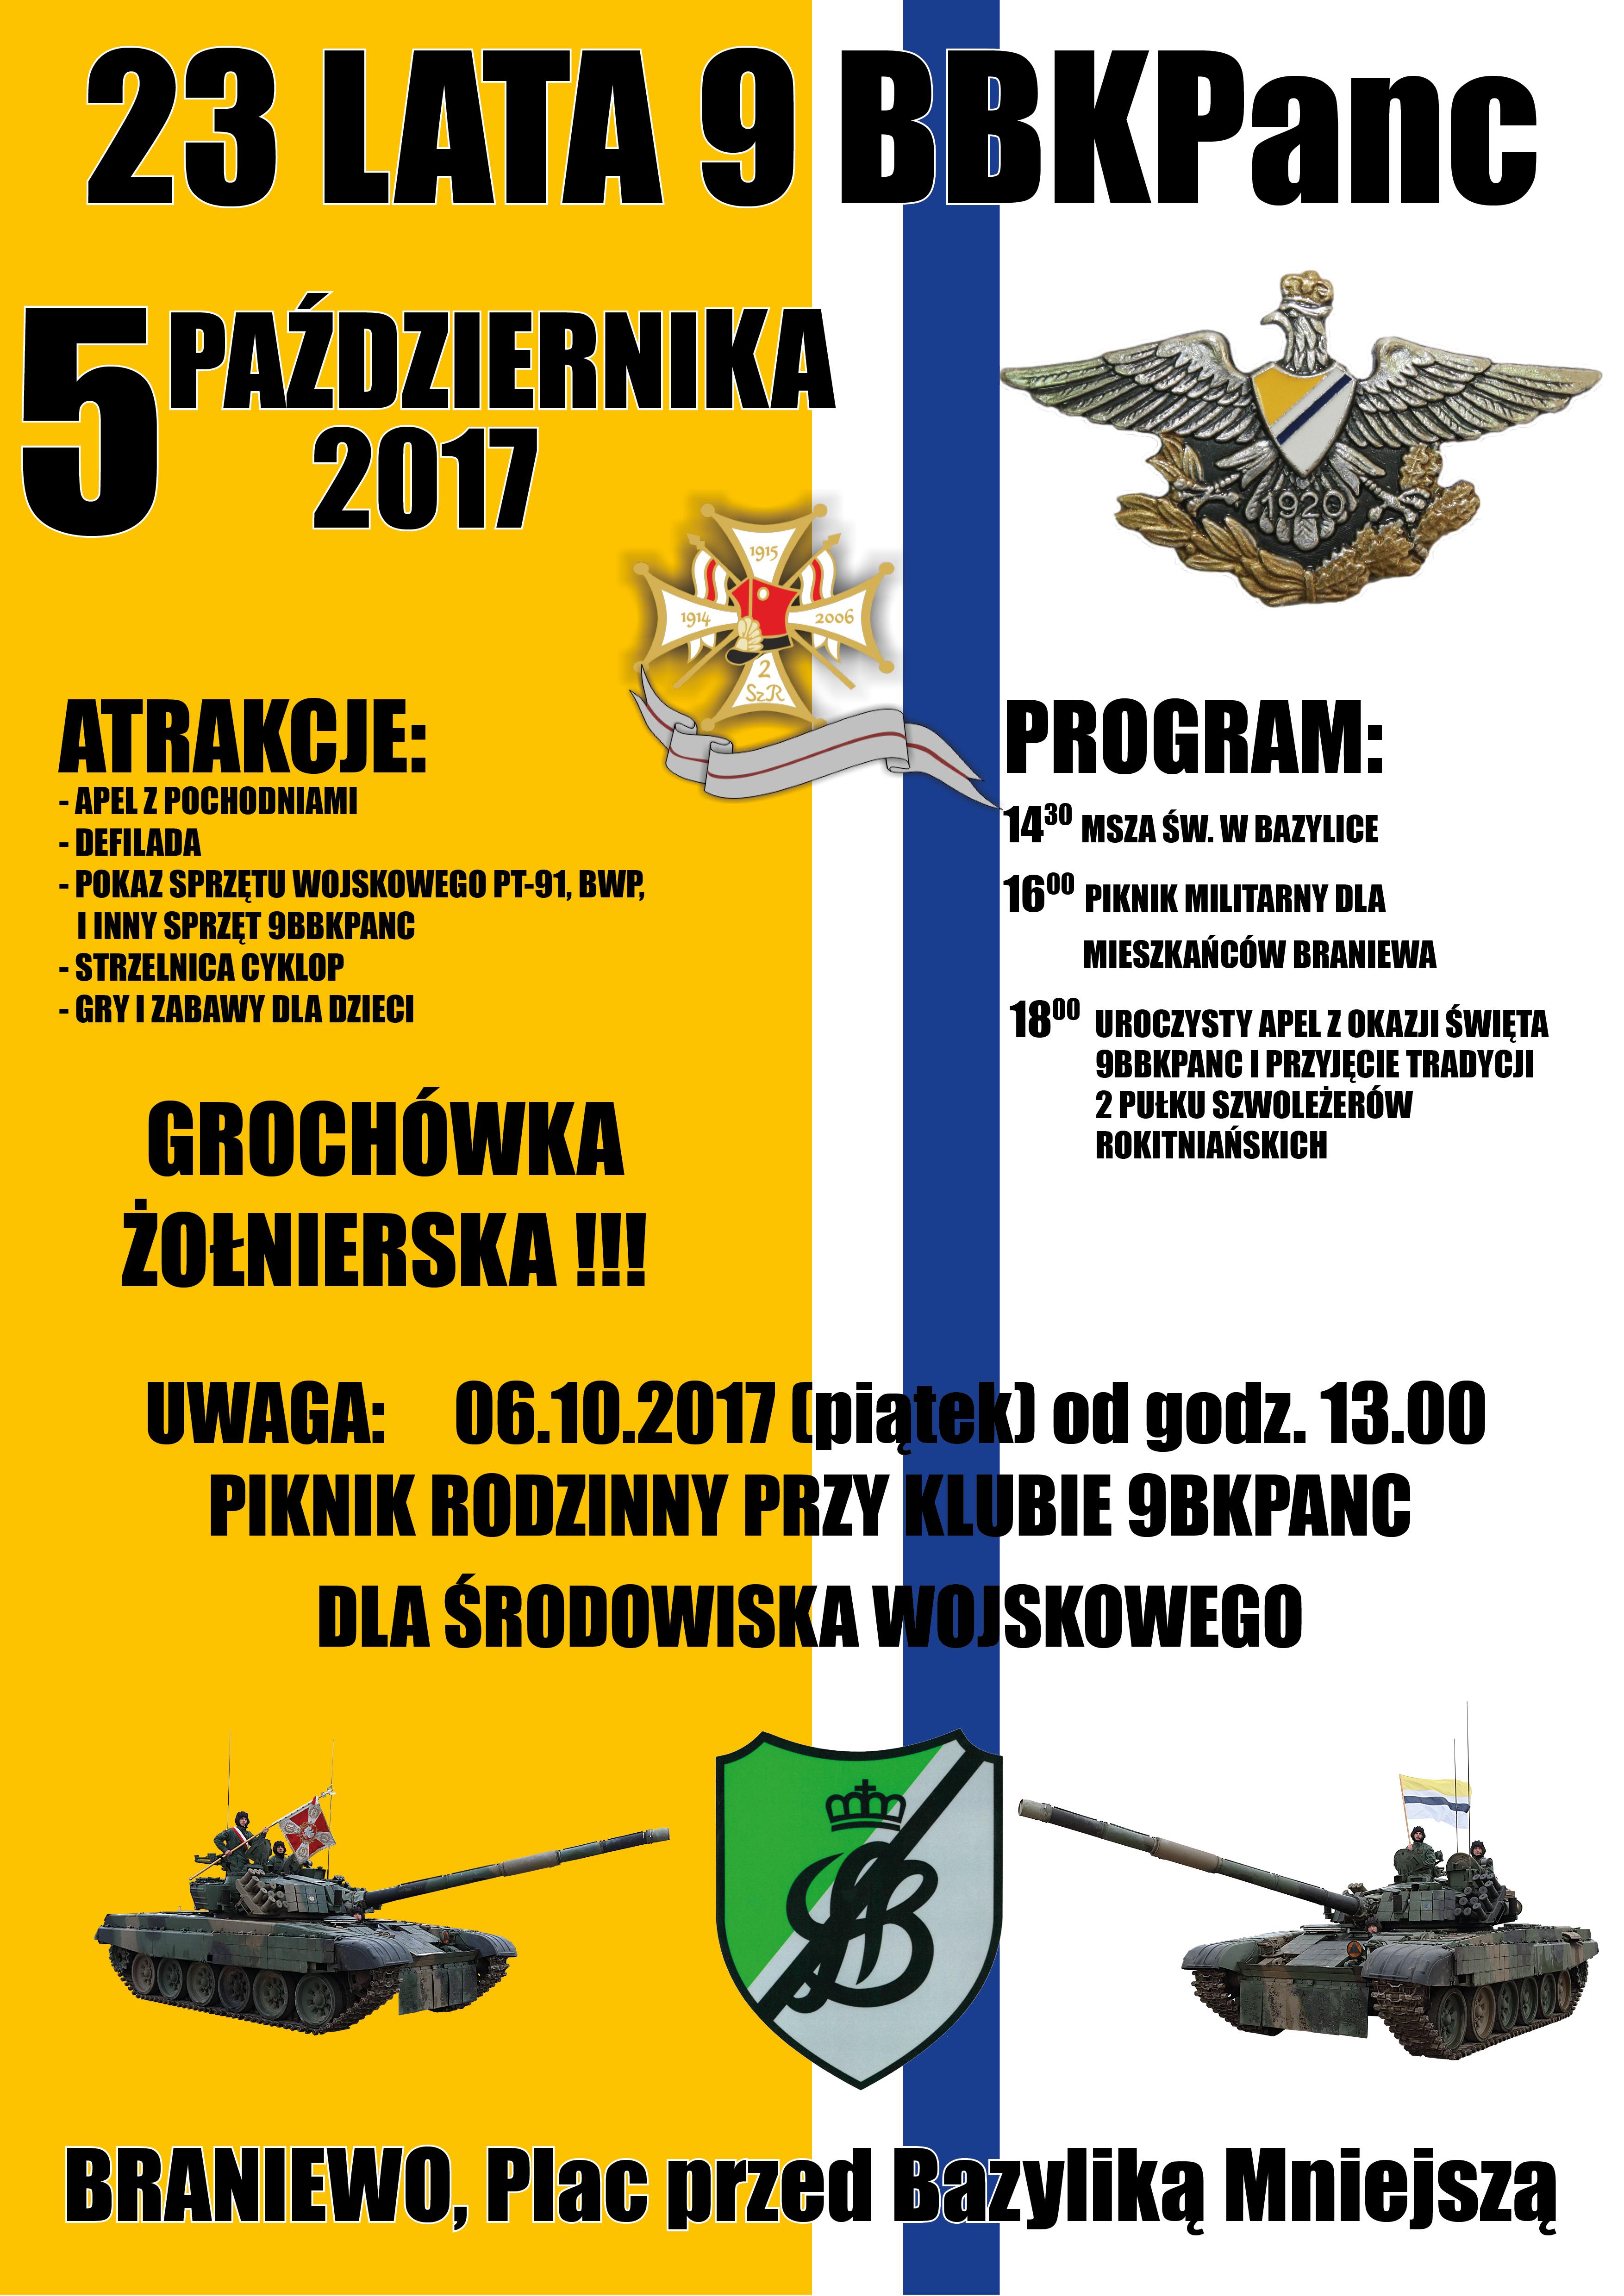 http://m.wm.pl/2017/10/orig/plakat-s-wie-to-brygady-2017-419697.jpg